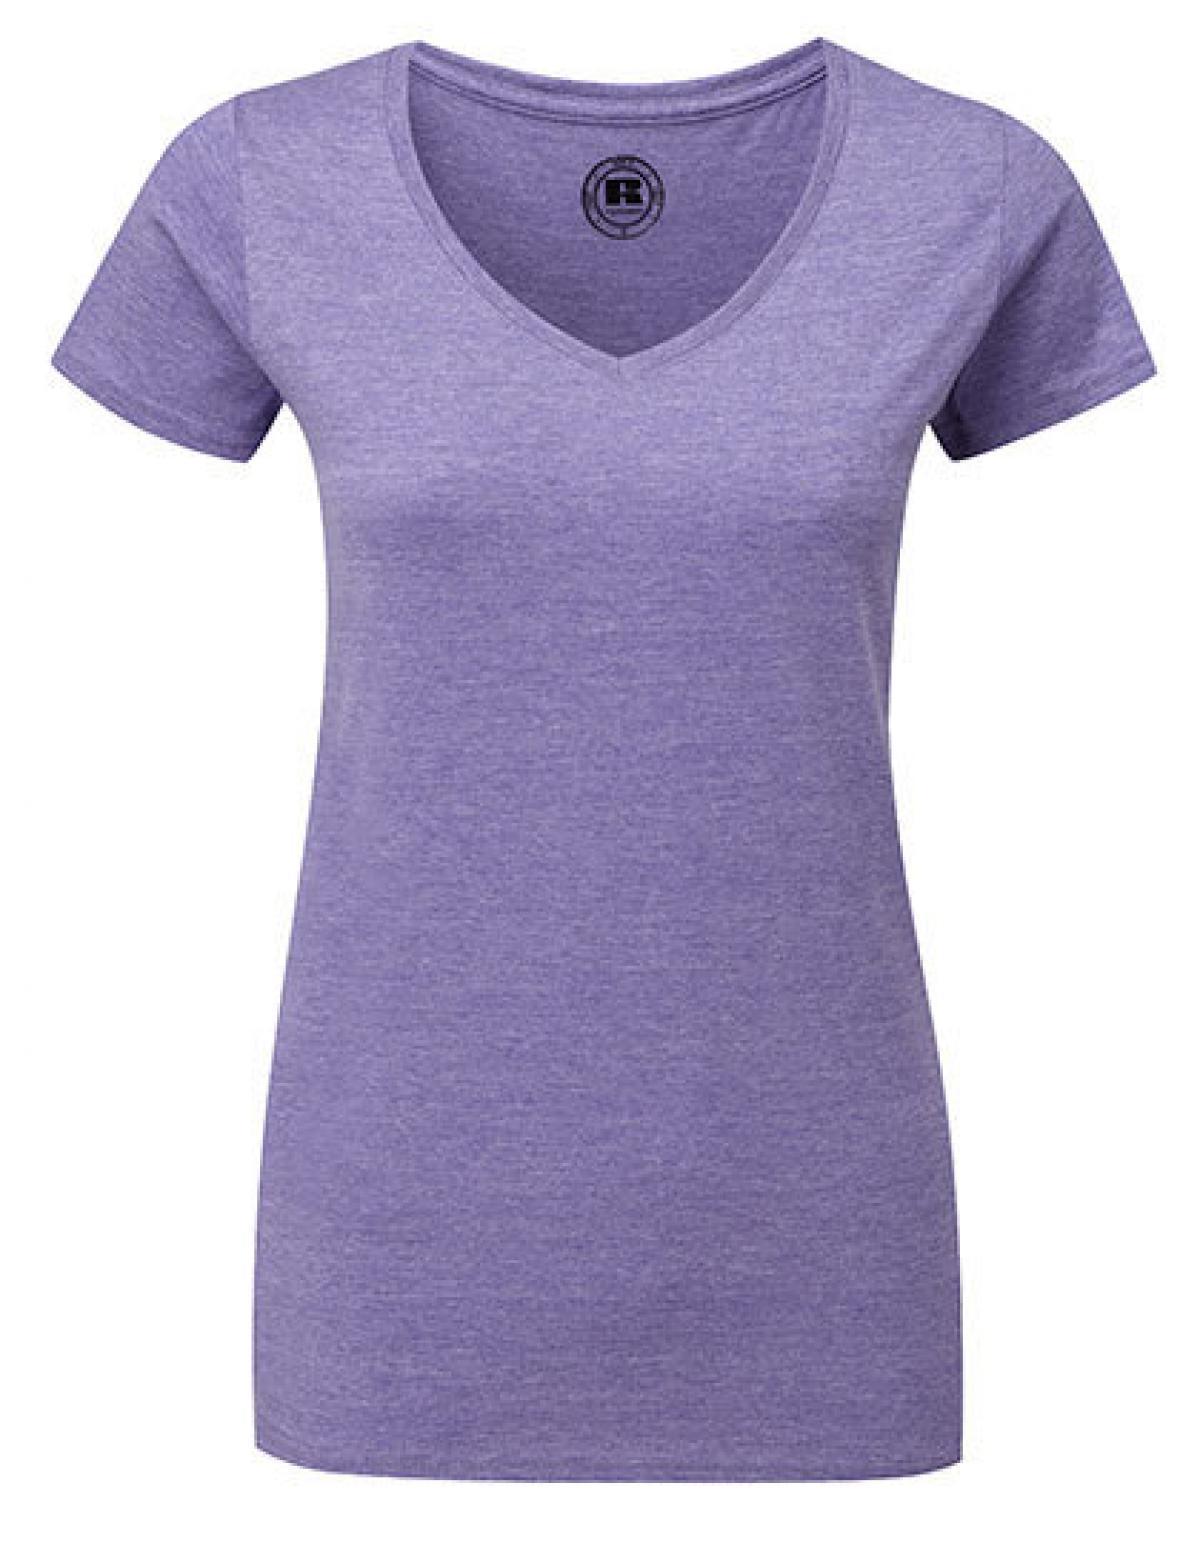 damen t shirt mit v ausschnitt oeko tex standard 100 rexlander s. Black Bedroom Furniture Sets. Home Design Ideas